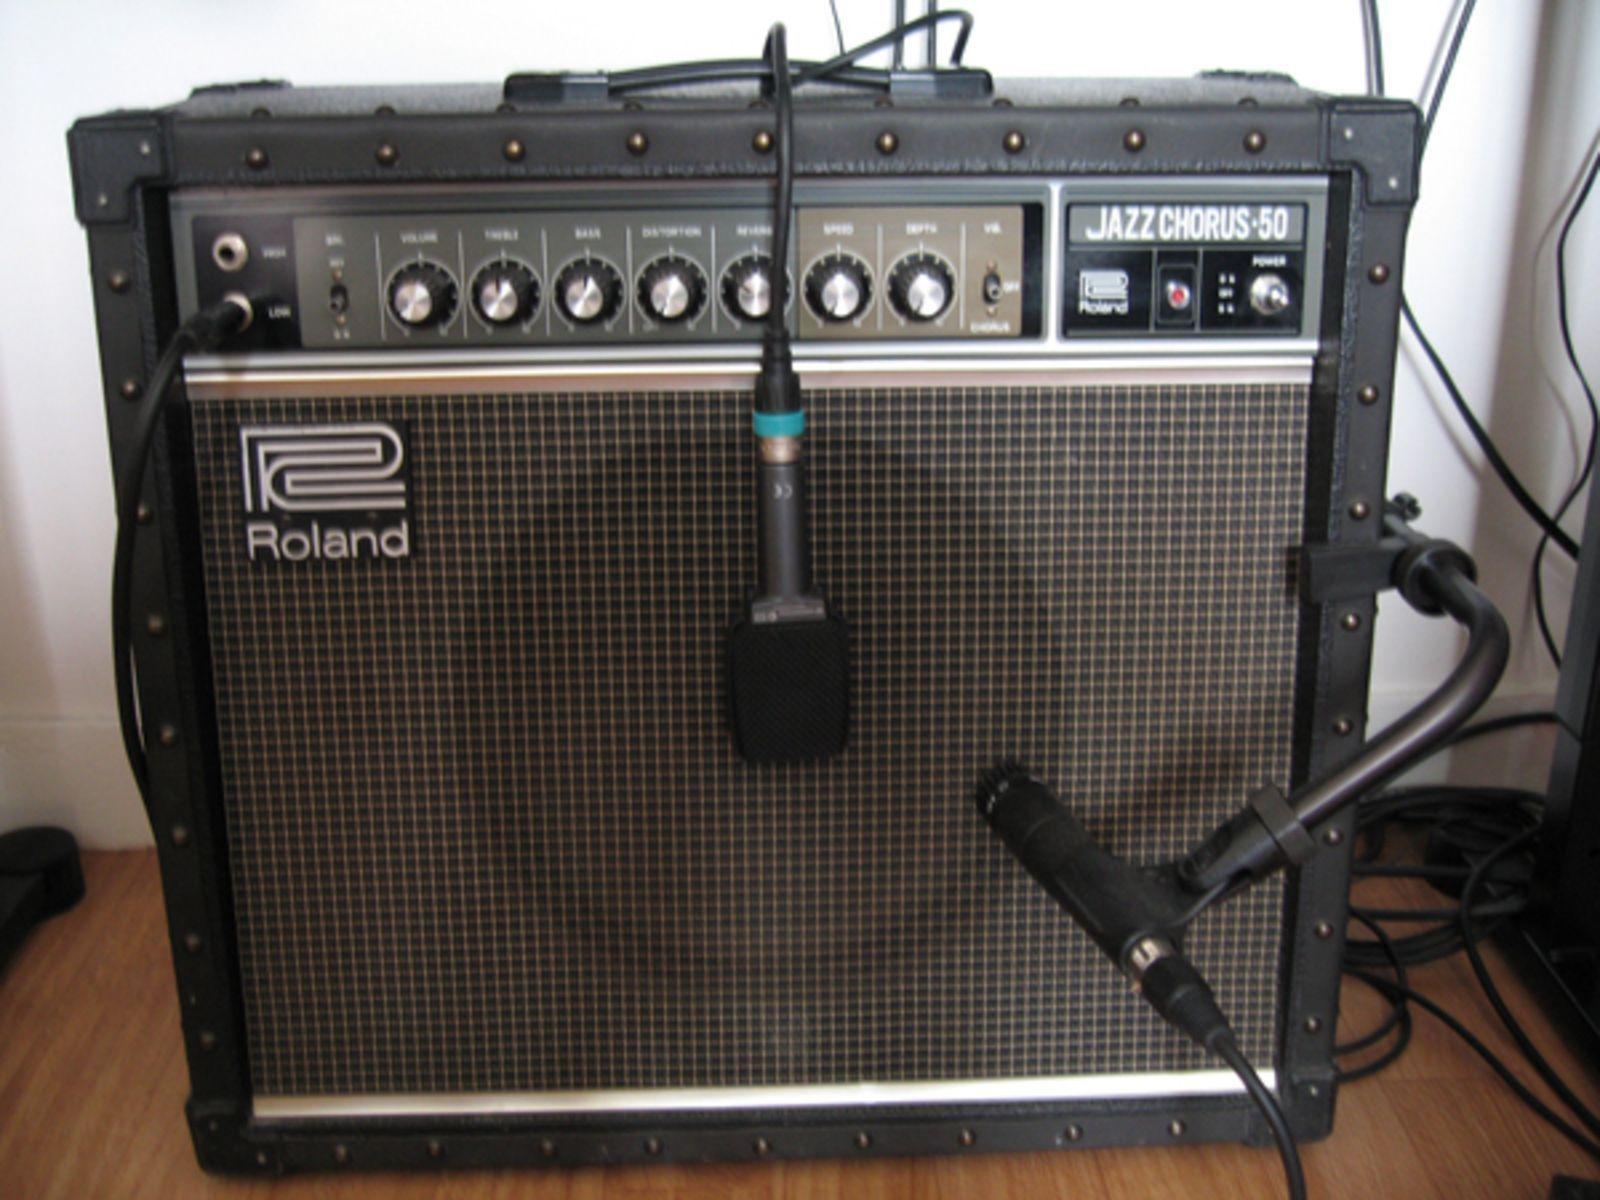 Roland JC-50 | redeye | Guitar amp, Fender guitars, Guitar rig